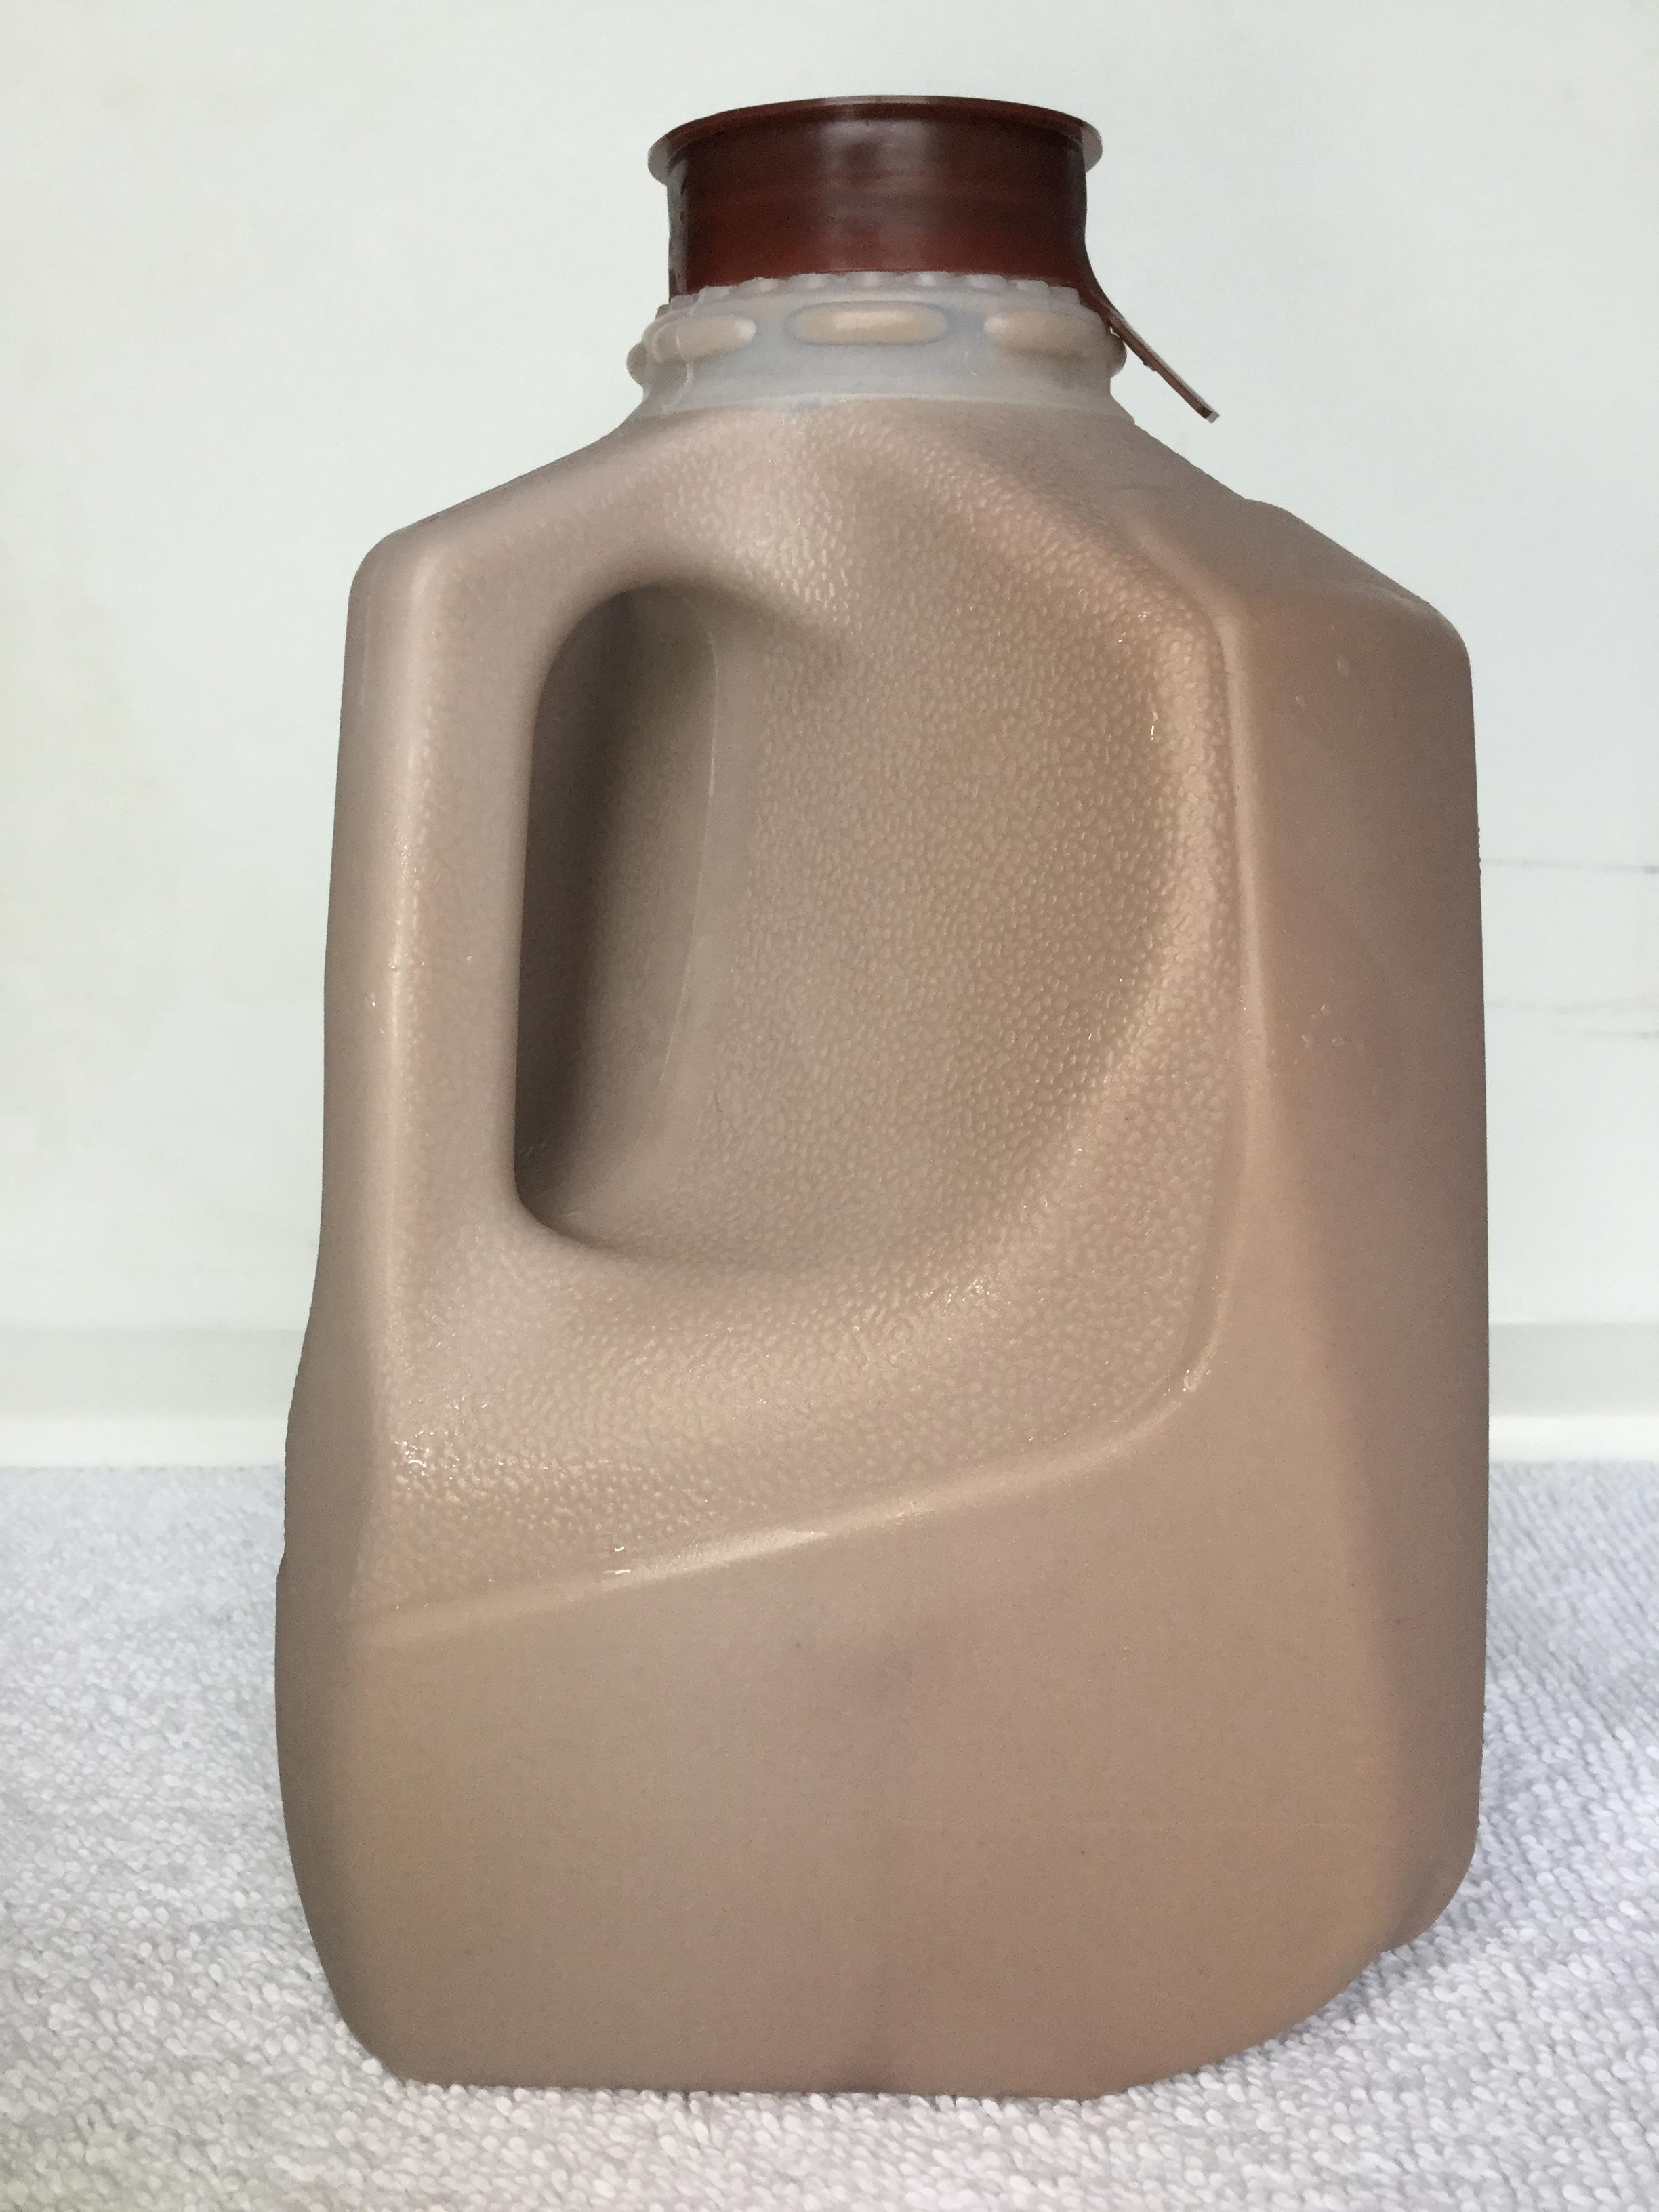 Perrydell Farm Chocolate Milk Side 1